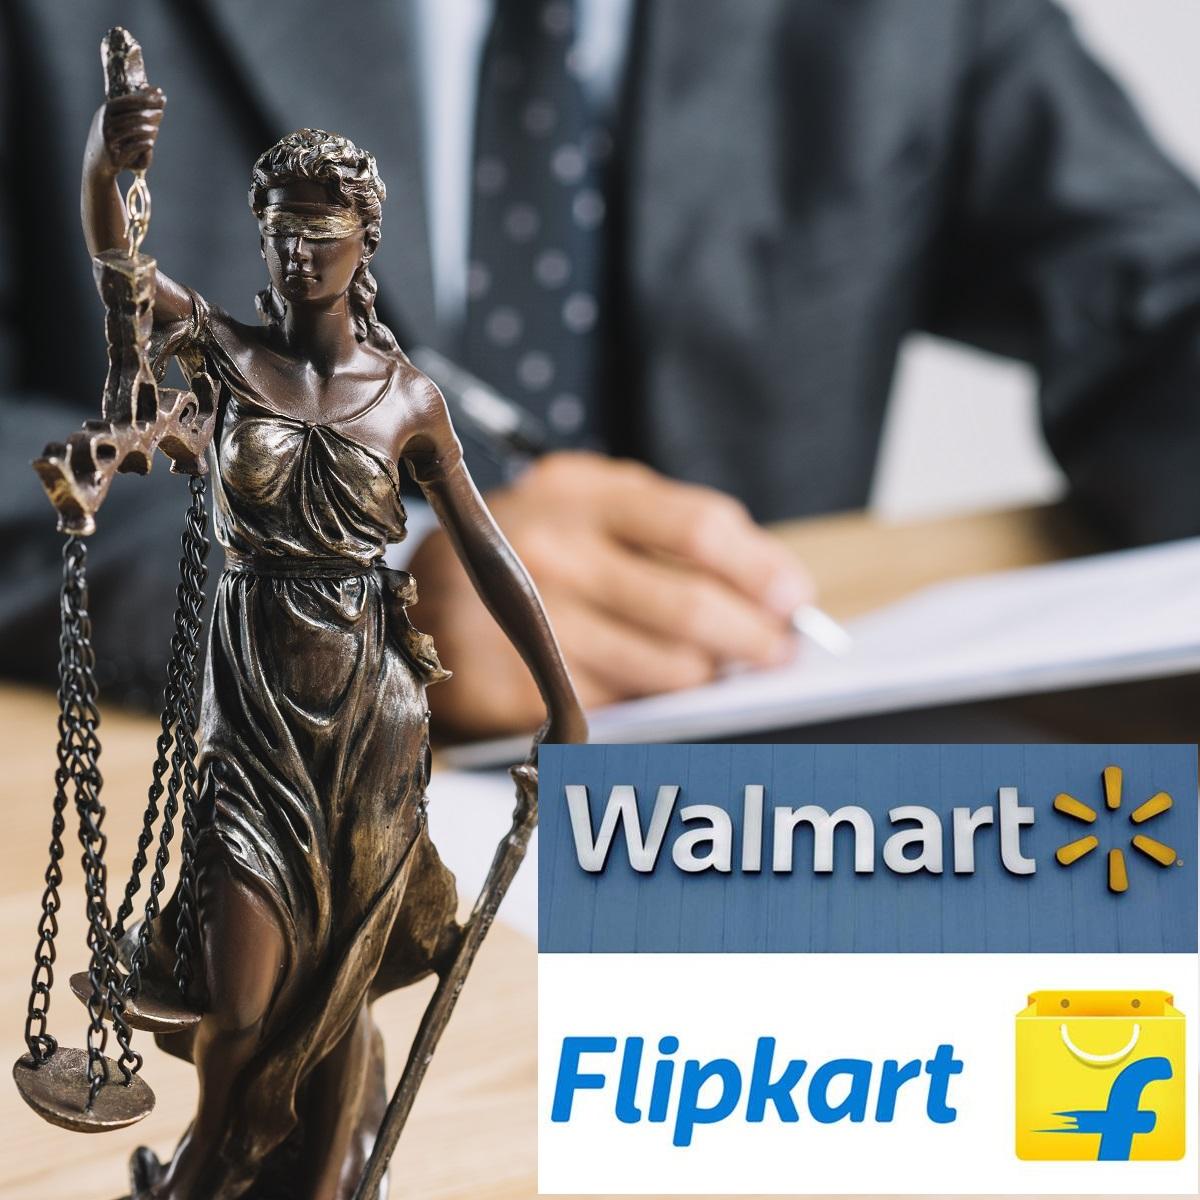 Flipkart-Walmart-Traders-Legal-Issues